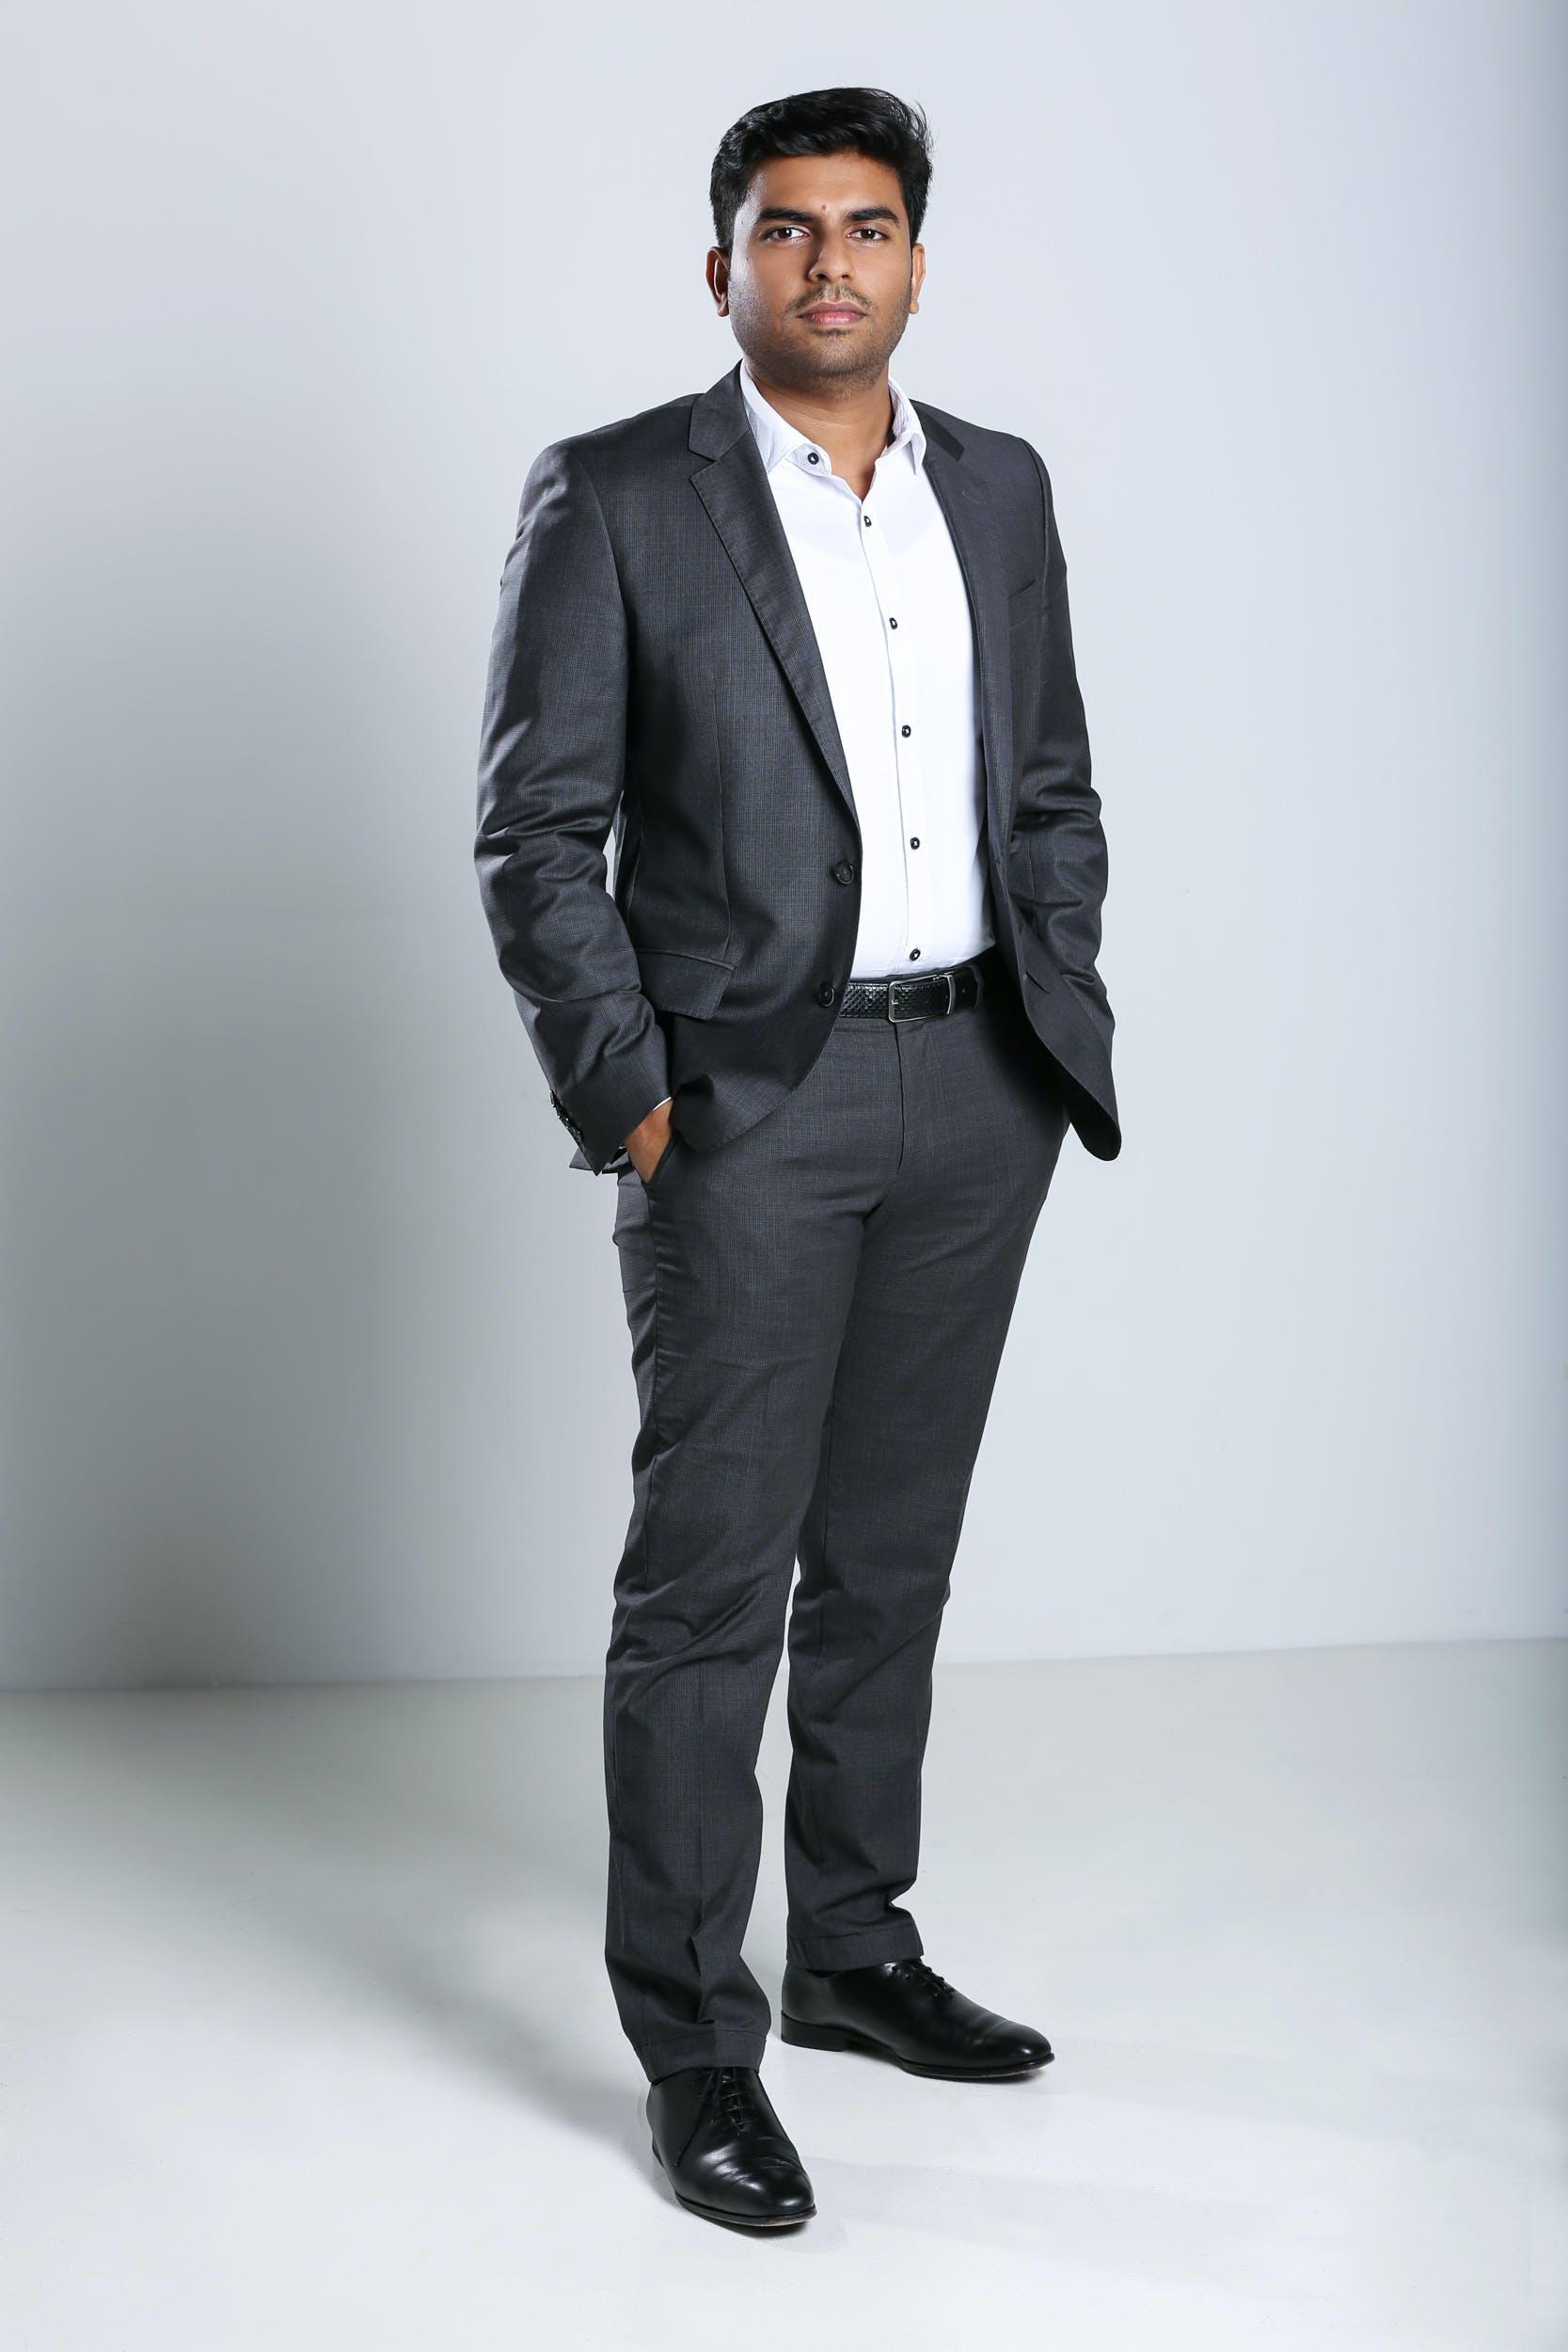 Akbar Basheer, employee, person